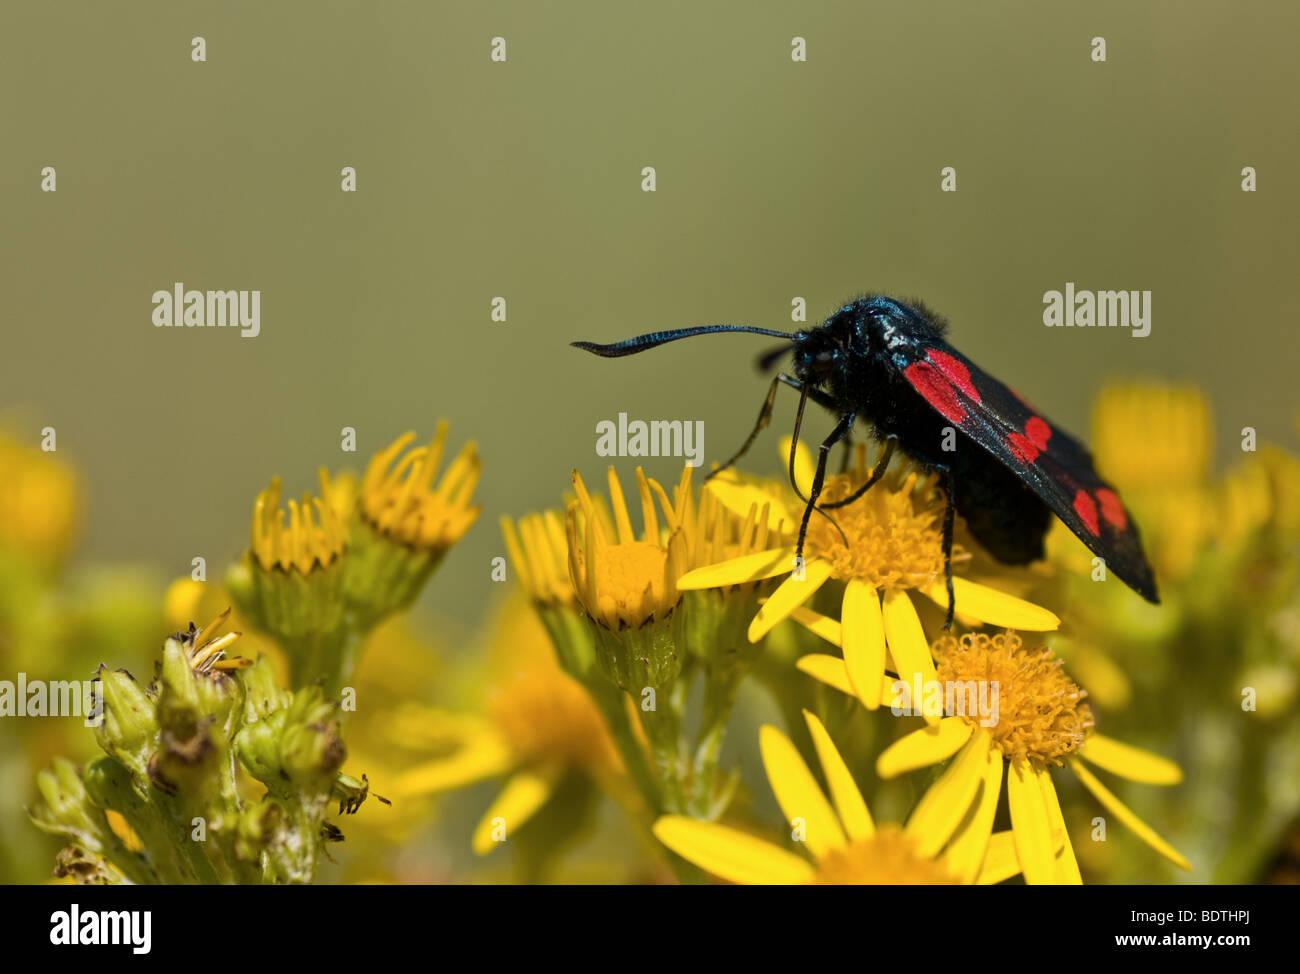 Six-Spot Burnet moth (Zygaena filipendulae) on Ragwort (Senecio jacobaea) Stock Photo